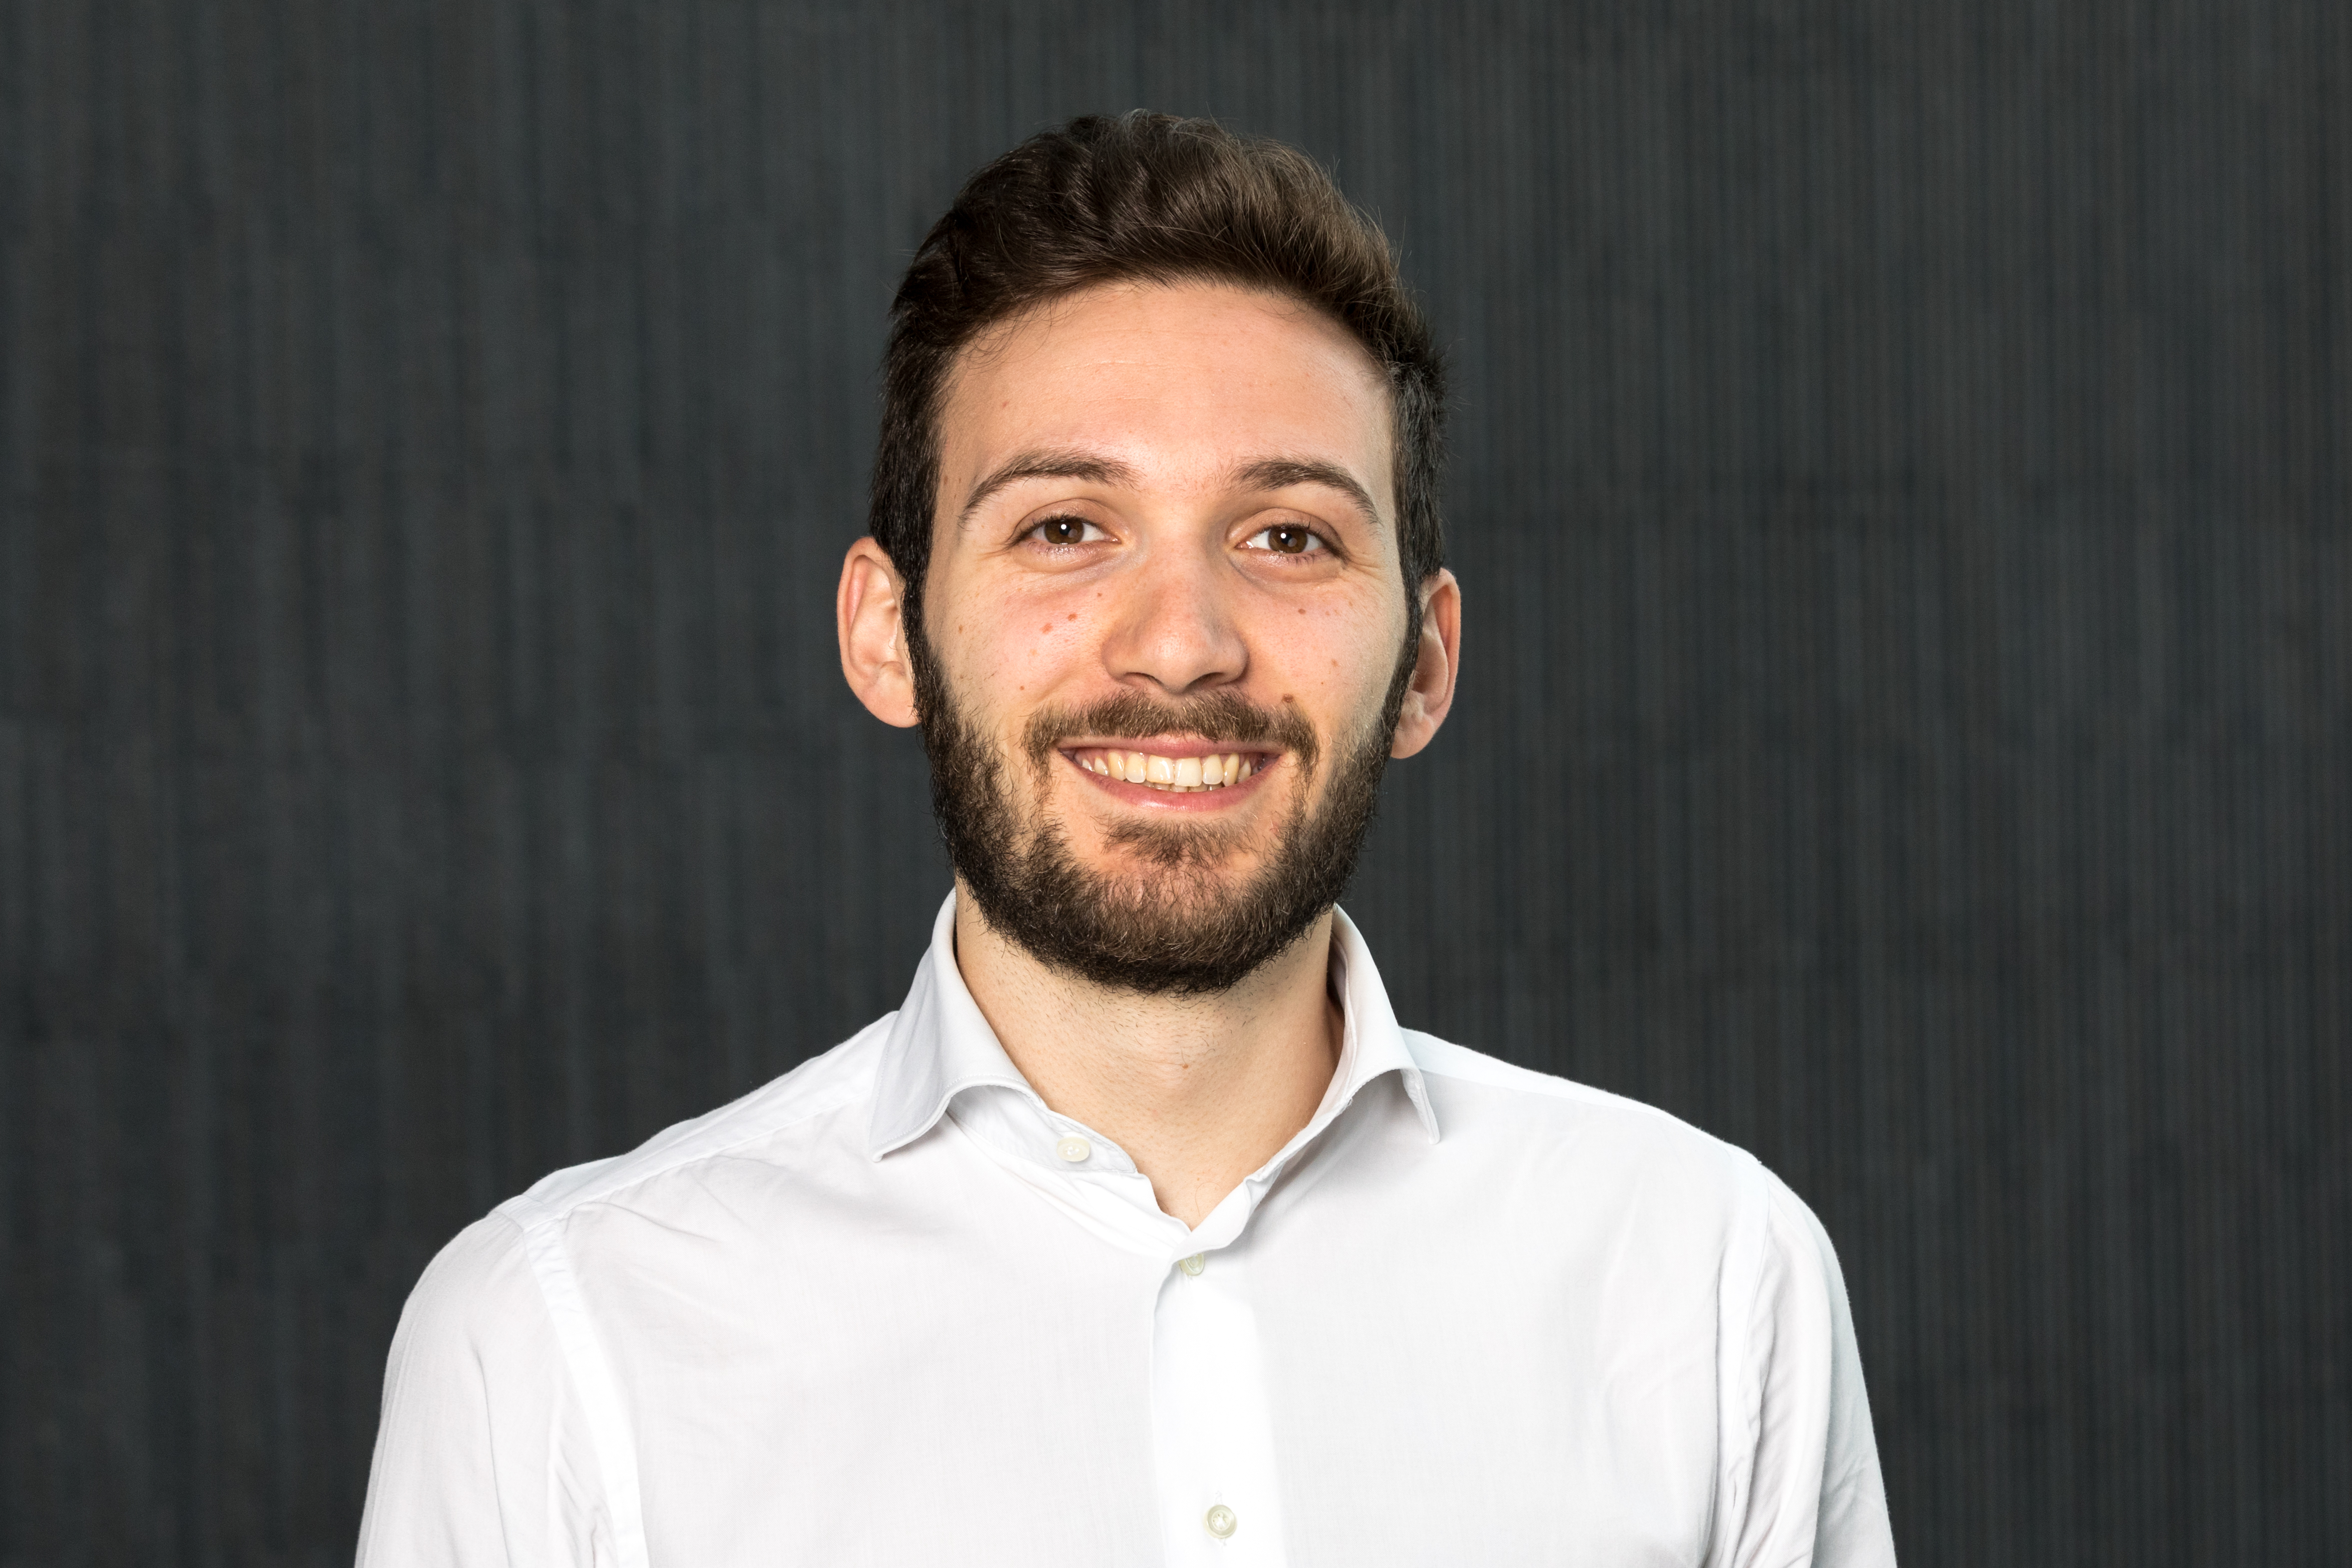 Dr. Ing. Fausto Romano, PhD